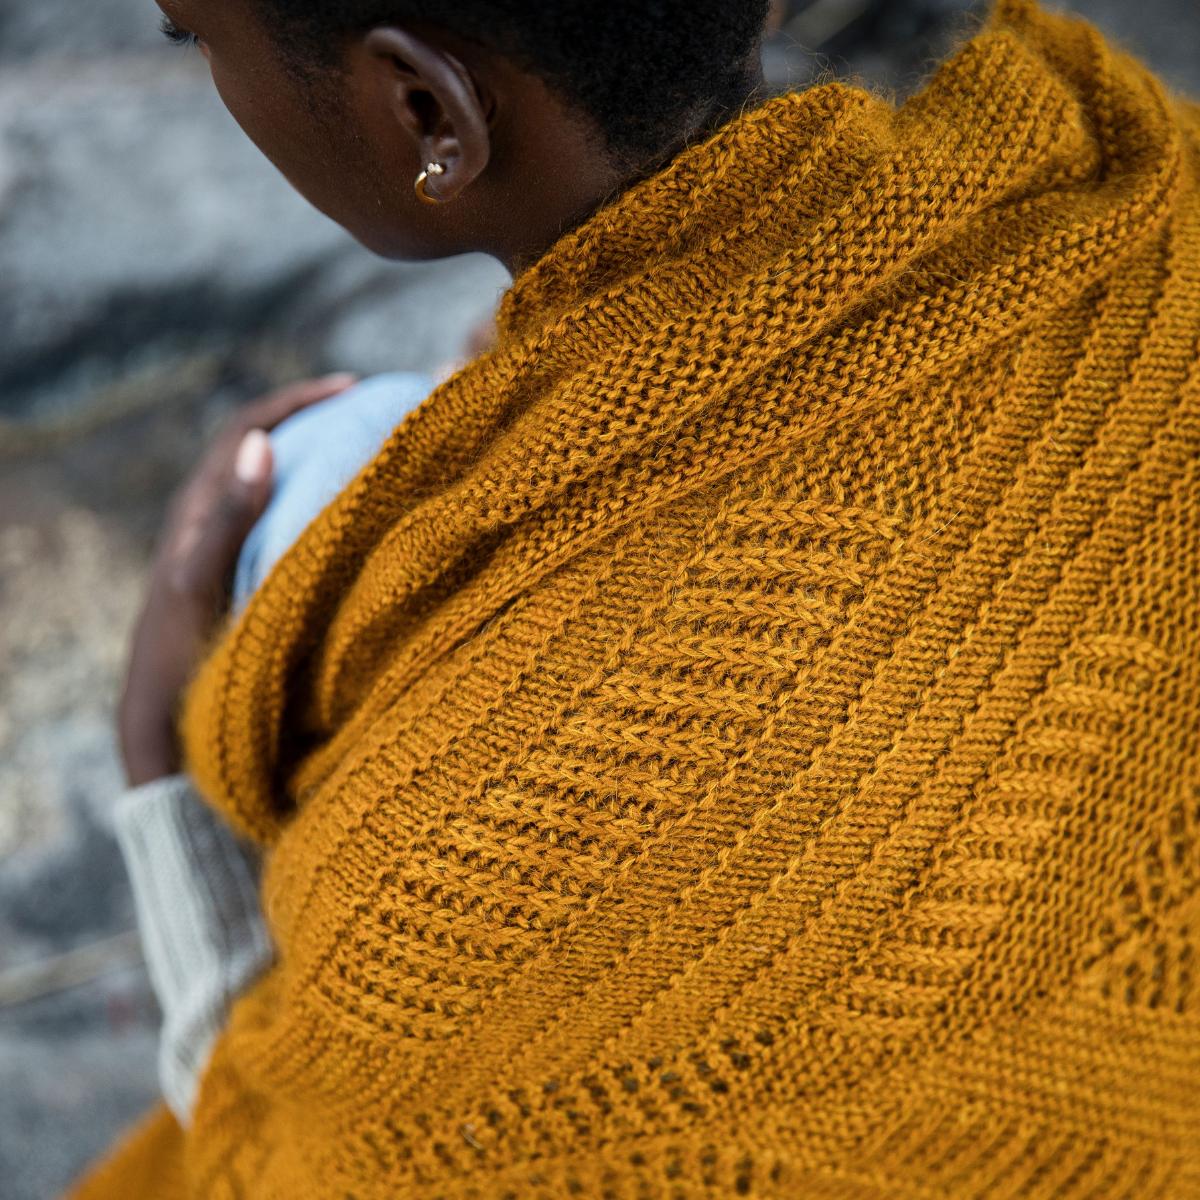 Laine Magazine Laine Issue 12 - Nordic Knit Life, Autumn 2021